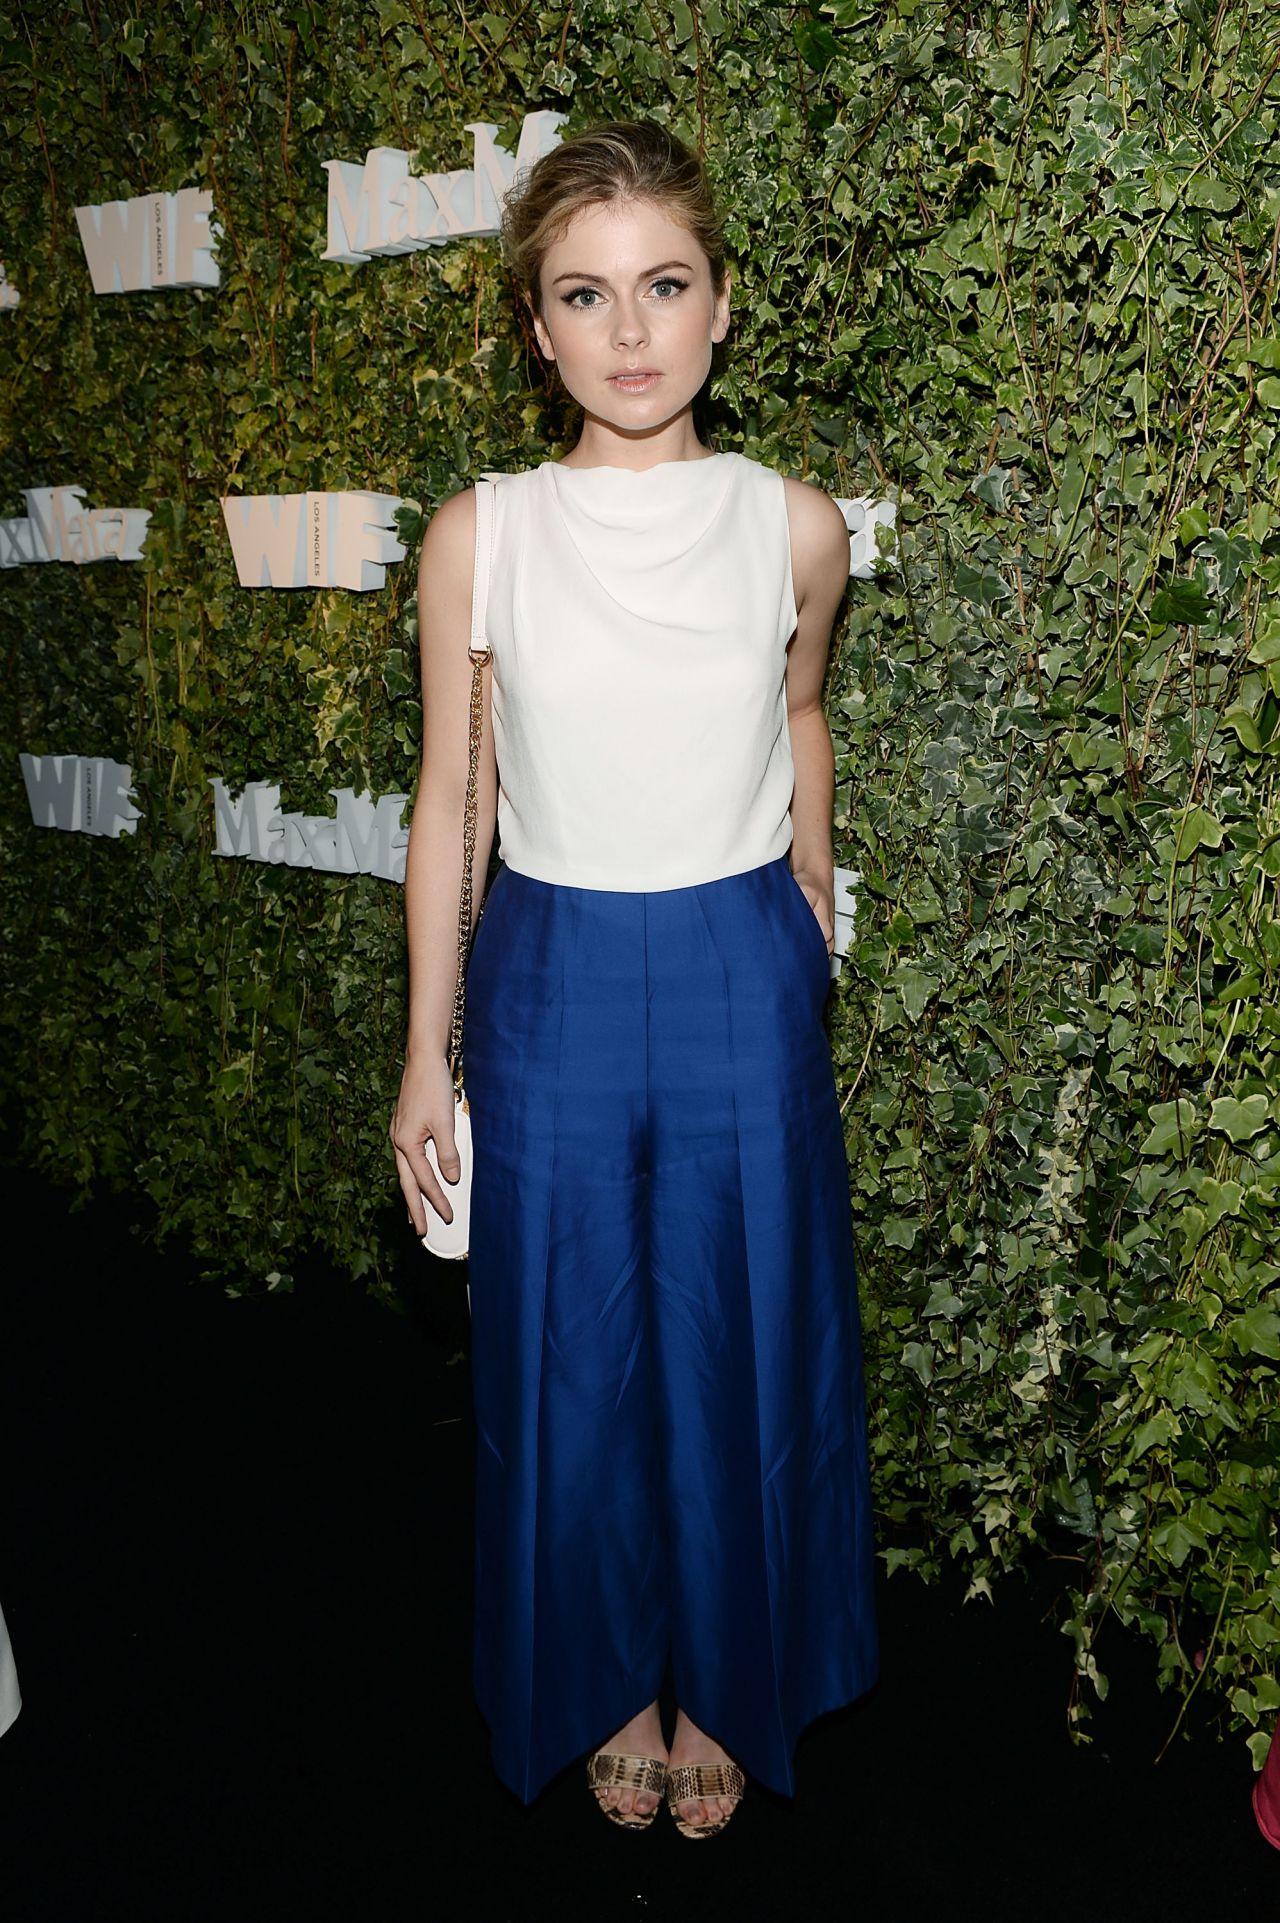 Rose Mciver Max Mara Celebrates Natalie Dormer The